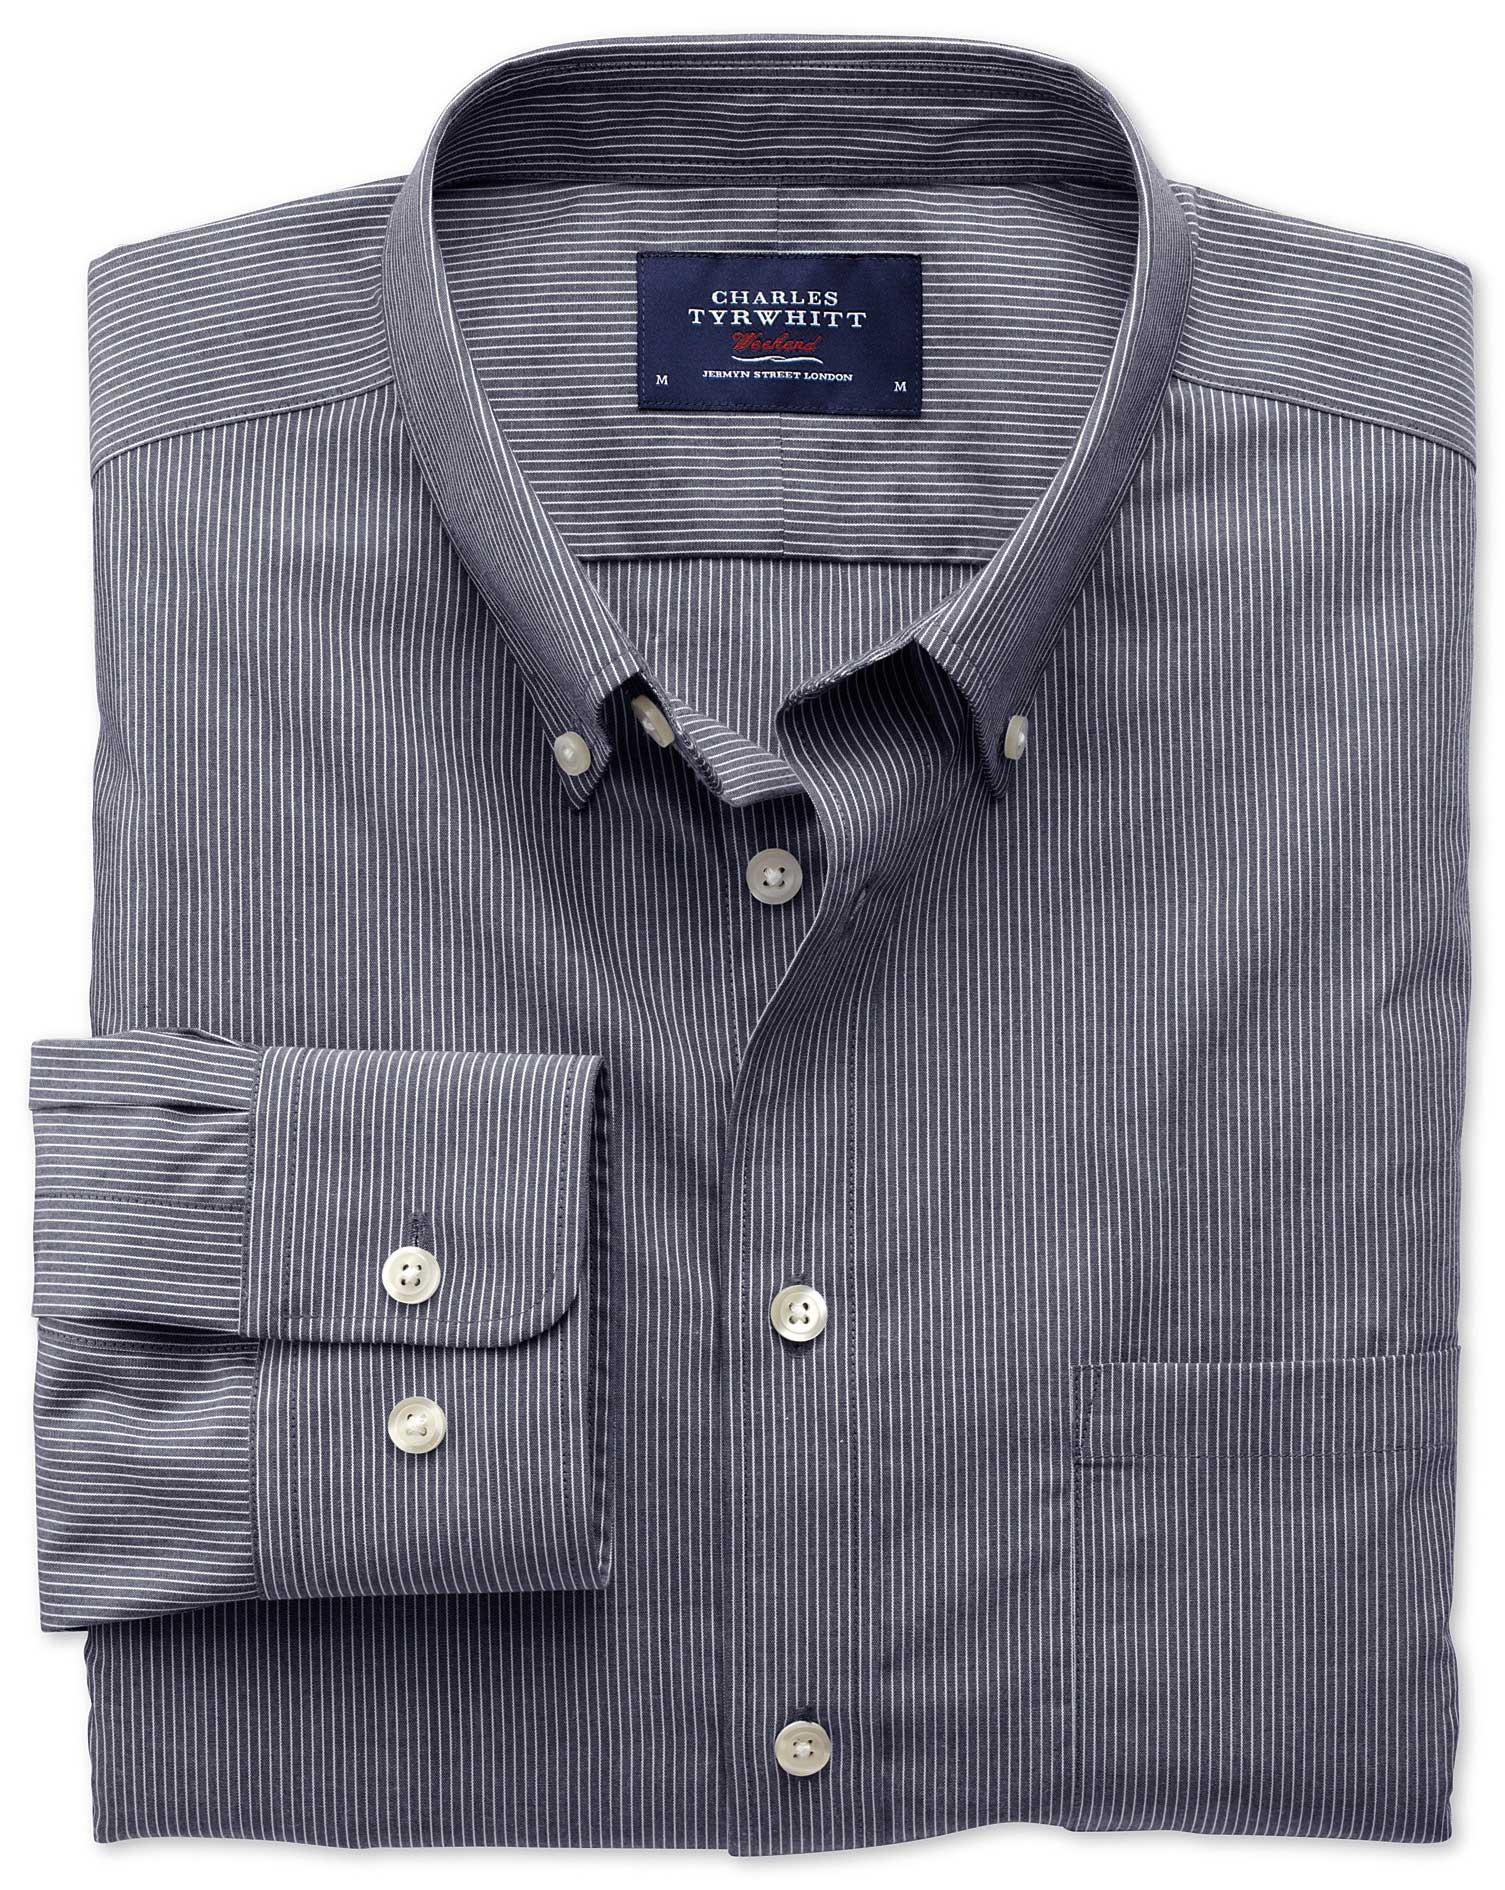 Extra Slim Fit Non-Iron Poplin Indigo Stripe Cotton Shirt Single Cuff Size Small by Charles Tyrwhitt